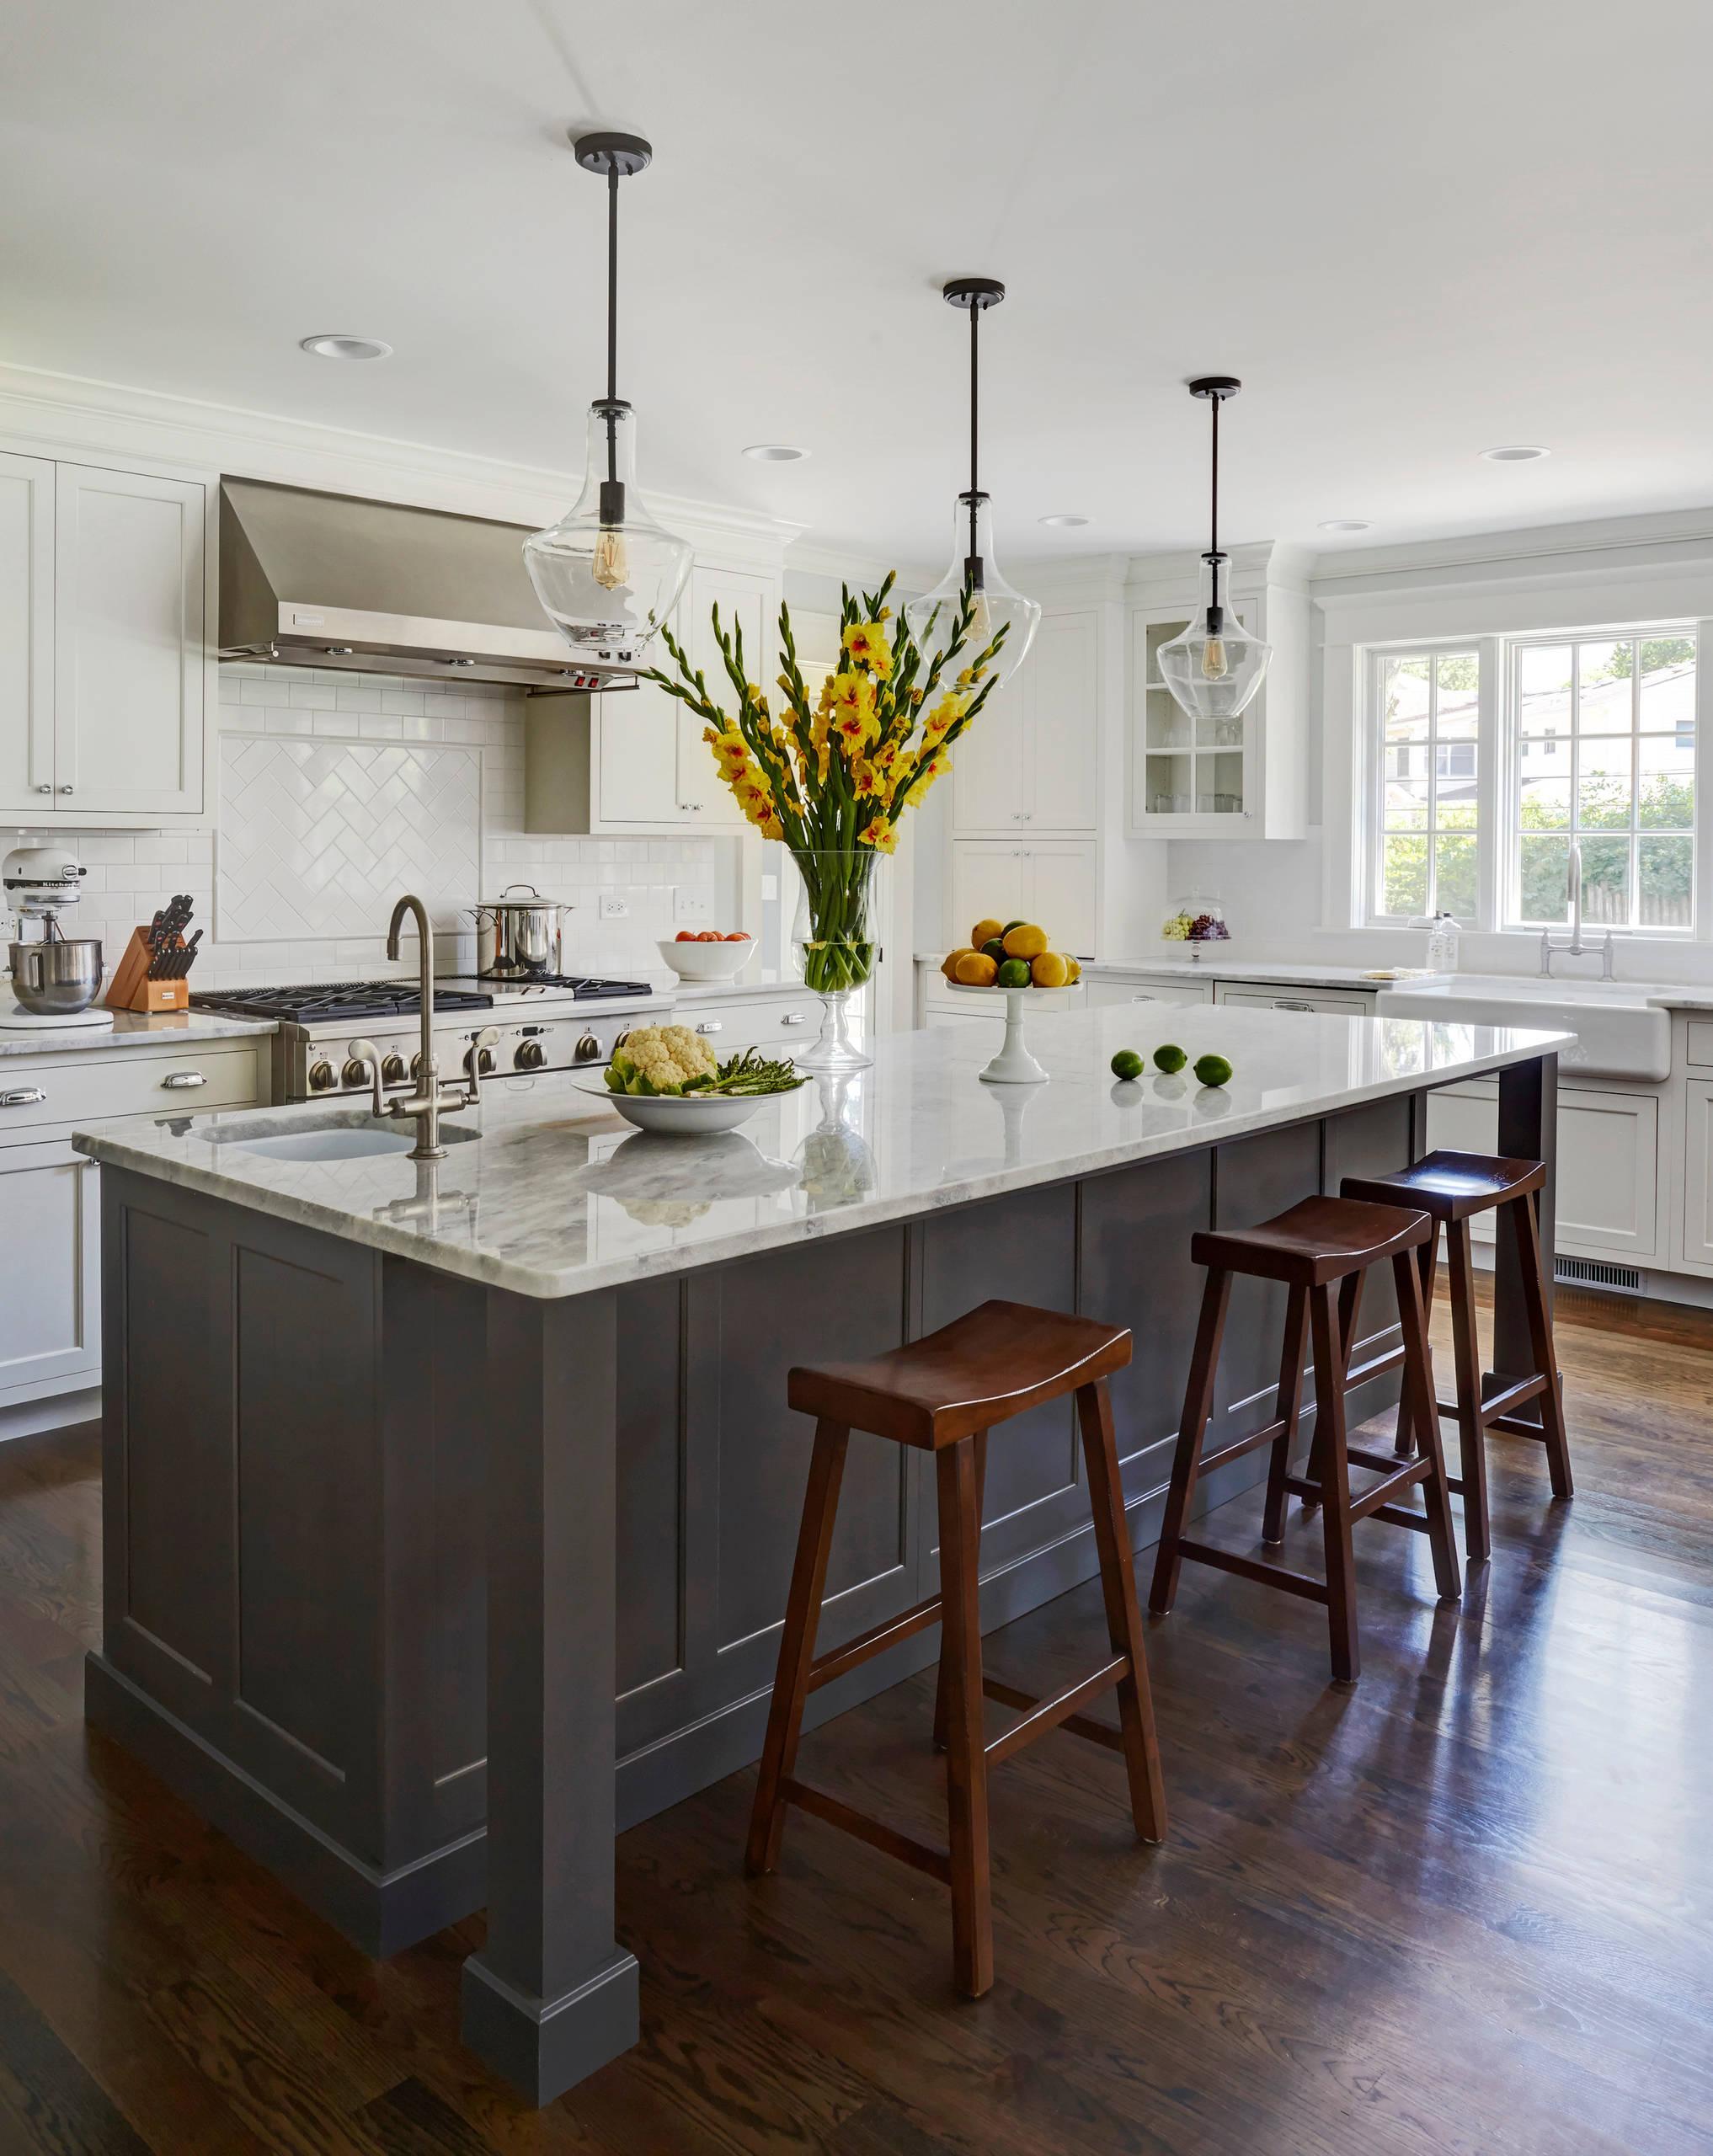 75 Beautiful Black Kitchen Pictures Ideas April 2021 Houzz